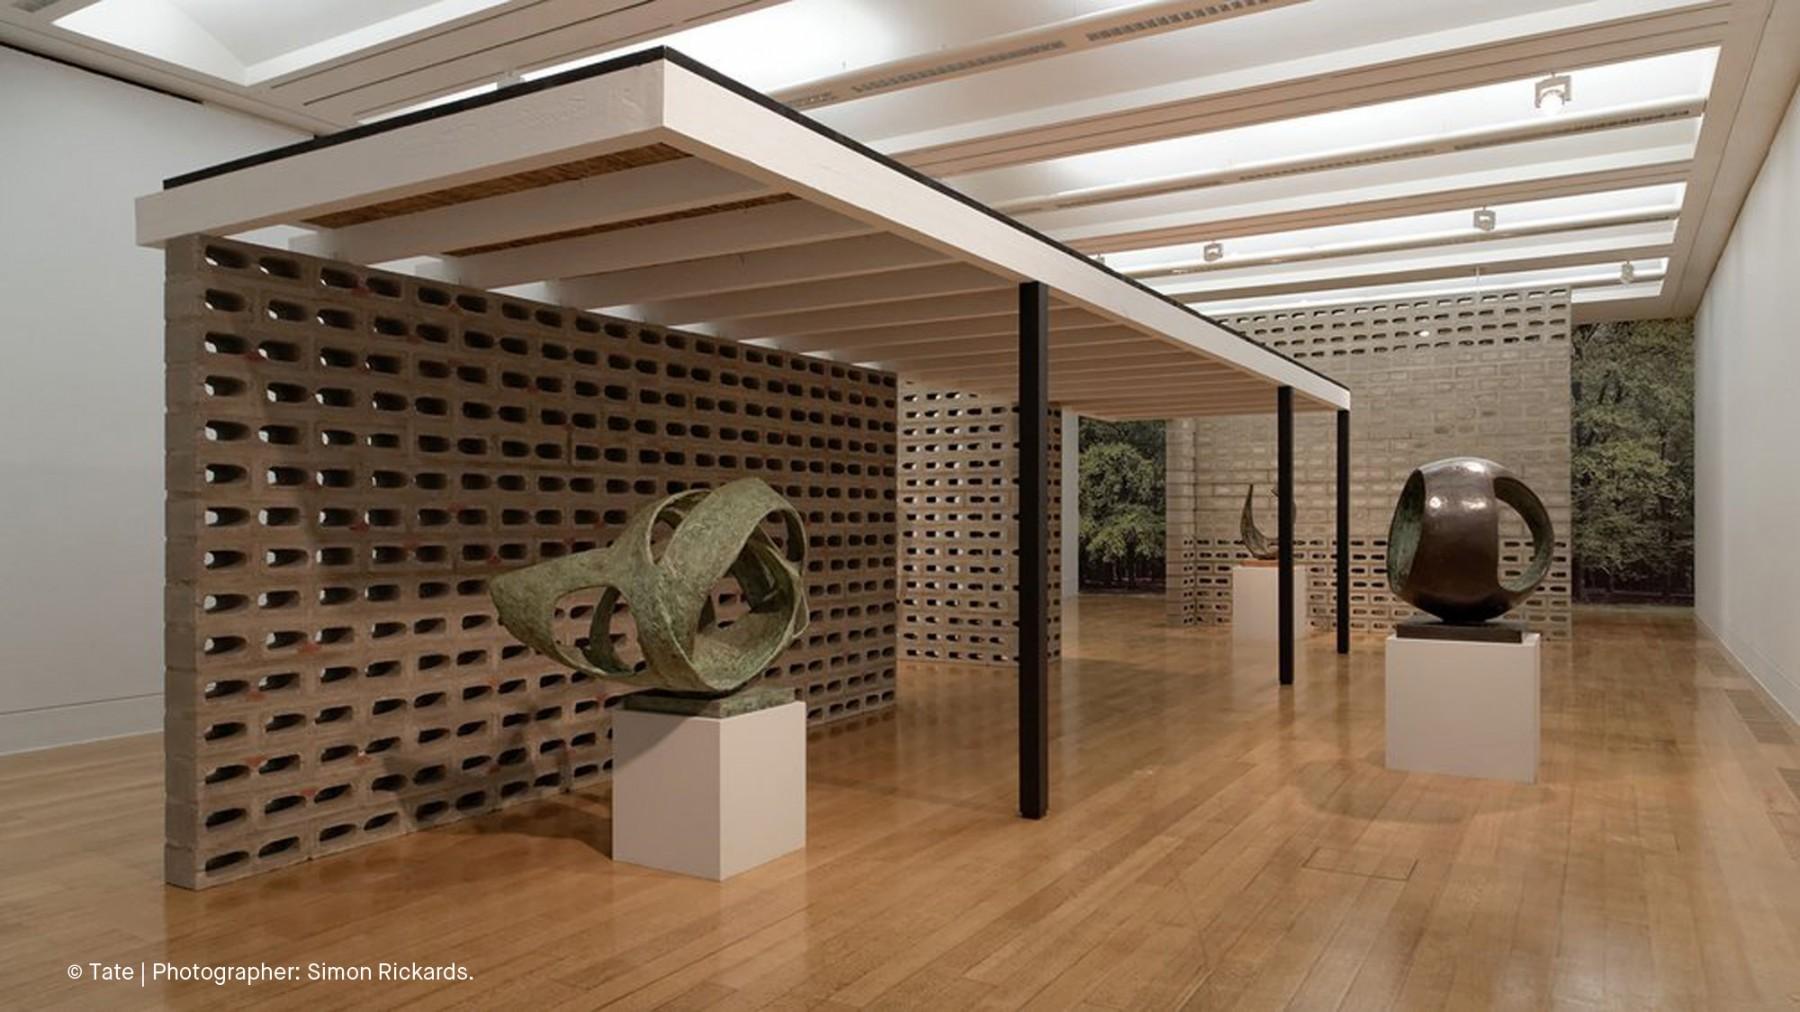 Jamie-Fobert-Architects-Hepworth-Exhibition-RCA-architecture-MA-design-Studio-Rietvald-pavilion